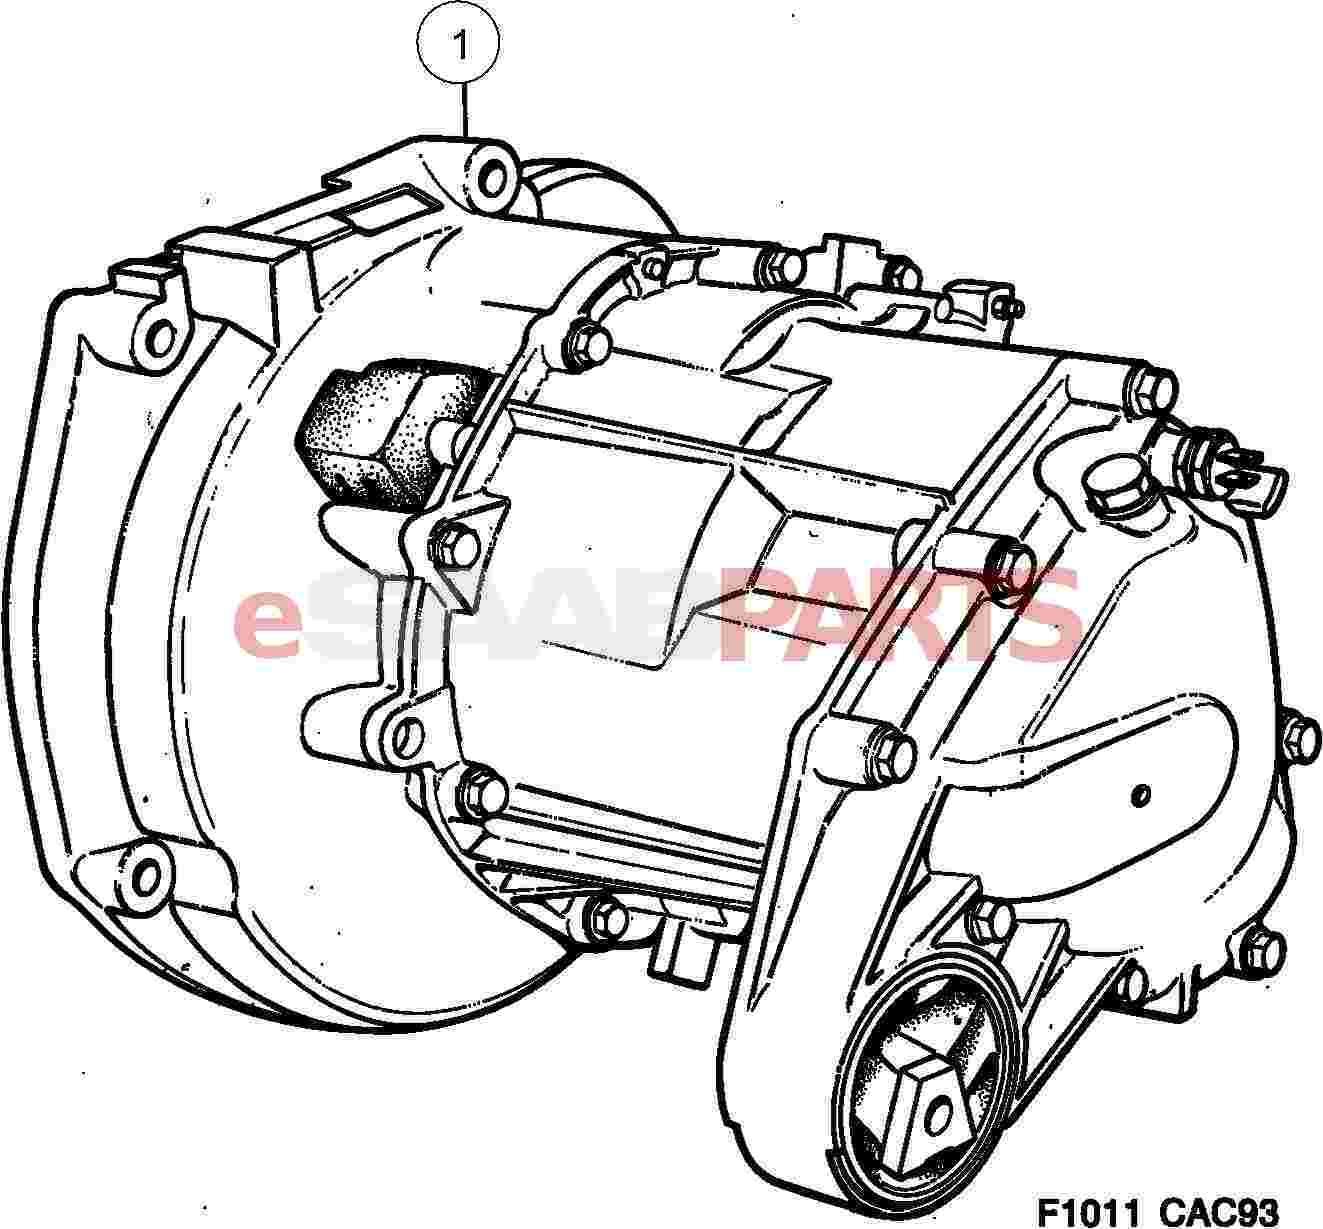 esaabparts com saab 9000 u003e transmission parts u003e transmission rh esaabparts com saab 9000 parts diagram Saab 9 3 Parts List